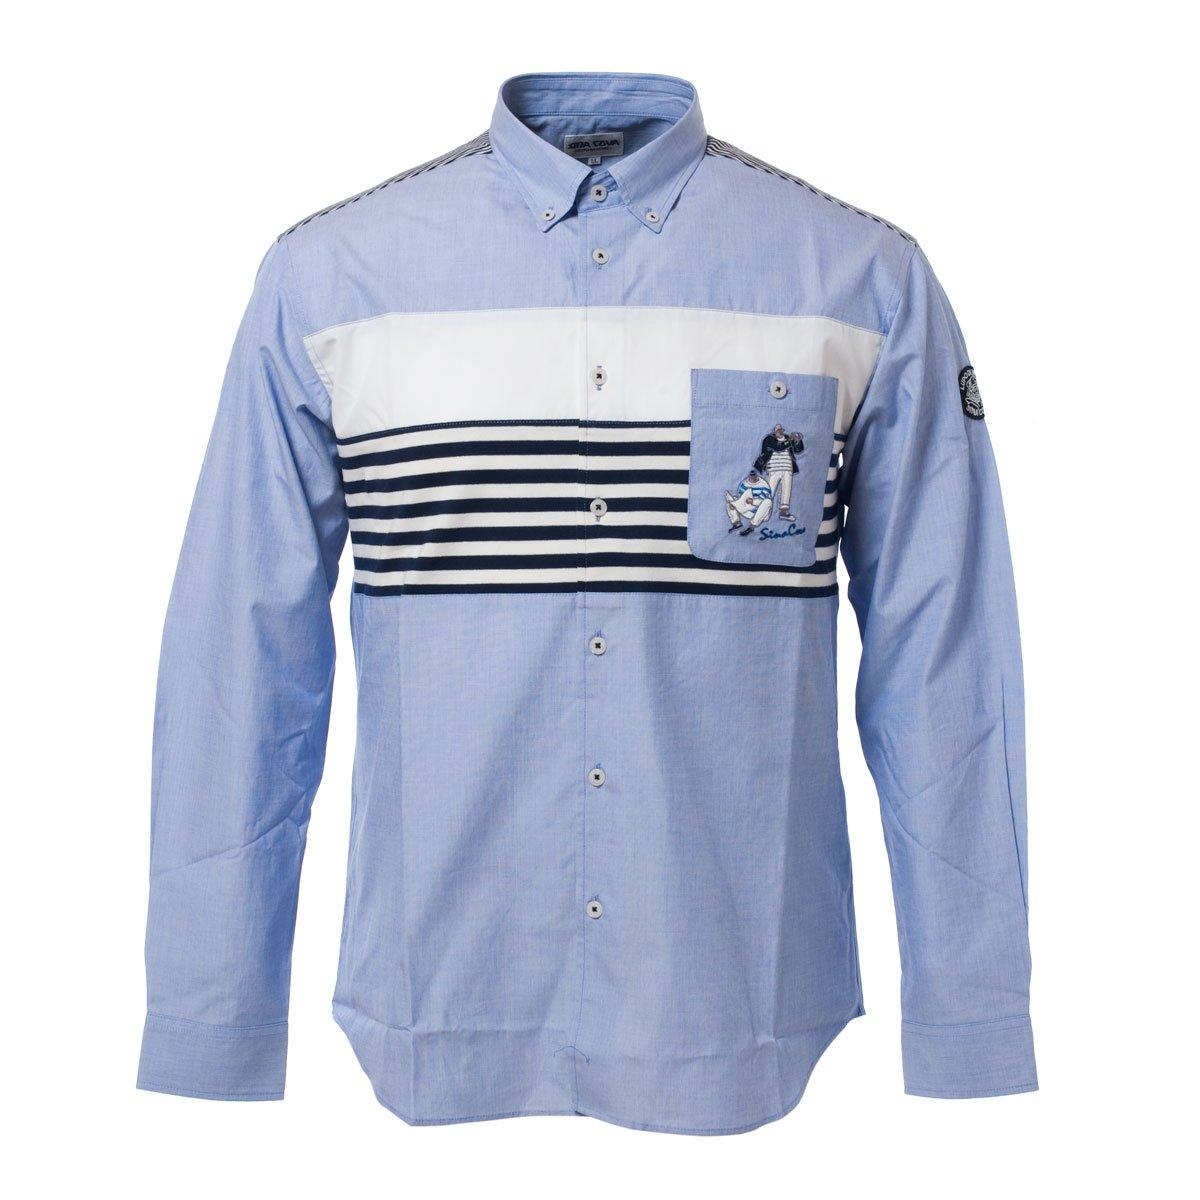 SINA COVA SINACOVA Men's Long Sleeve Shirt Blue Medium